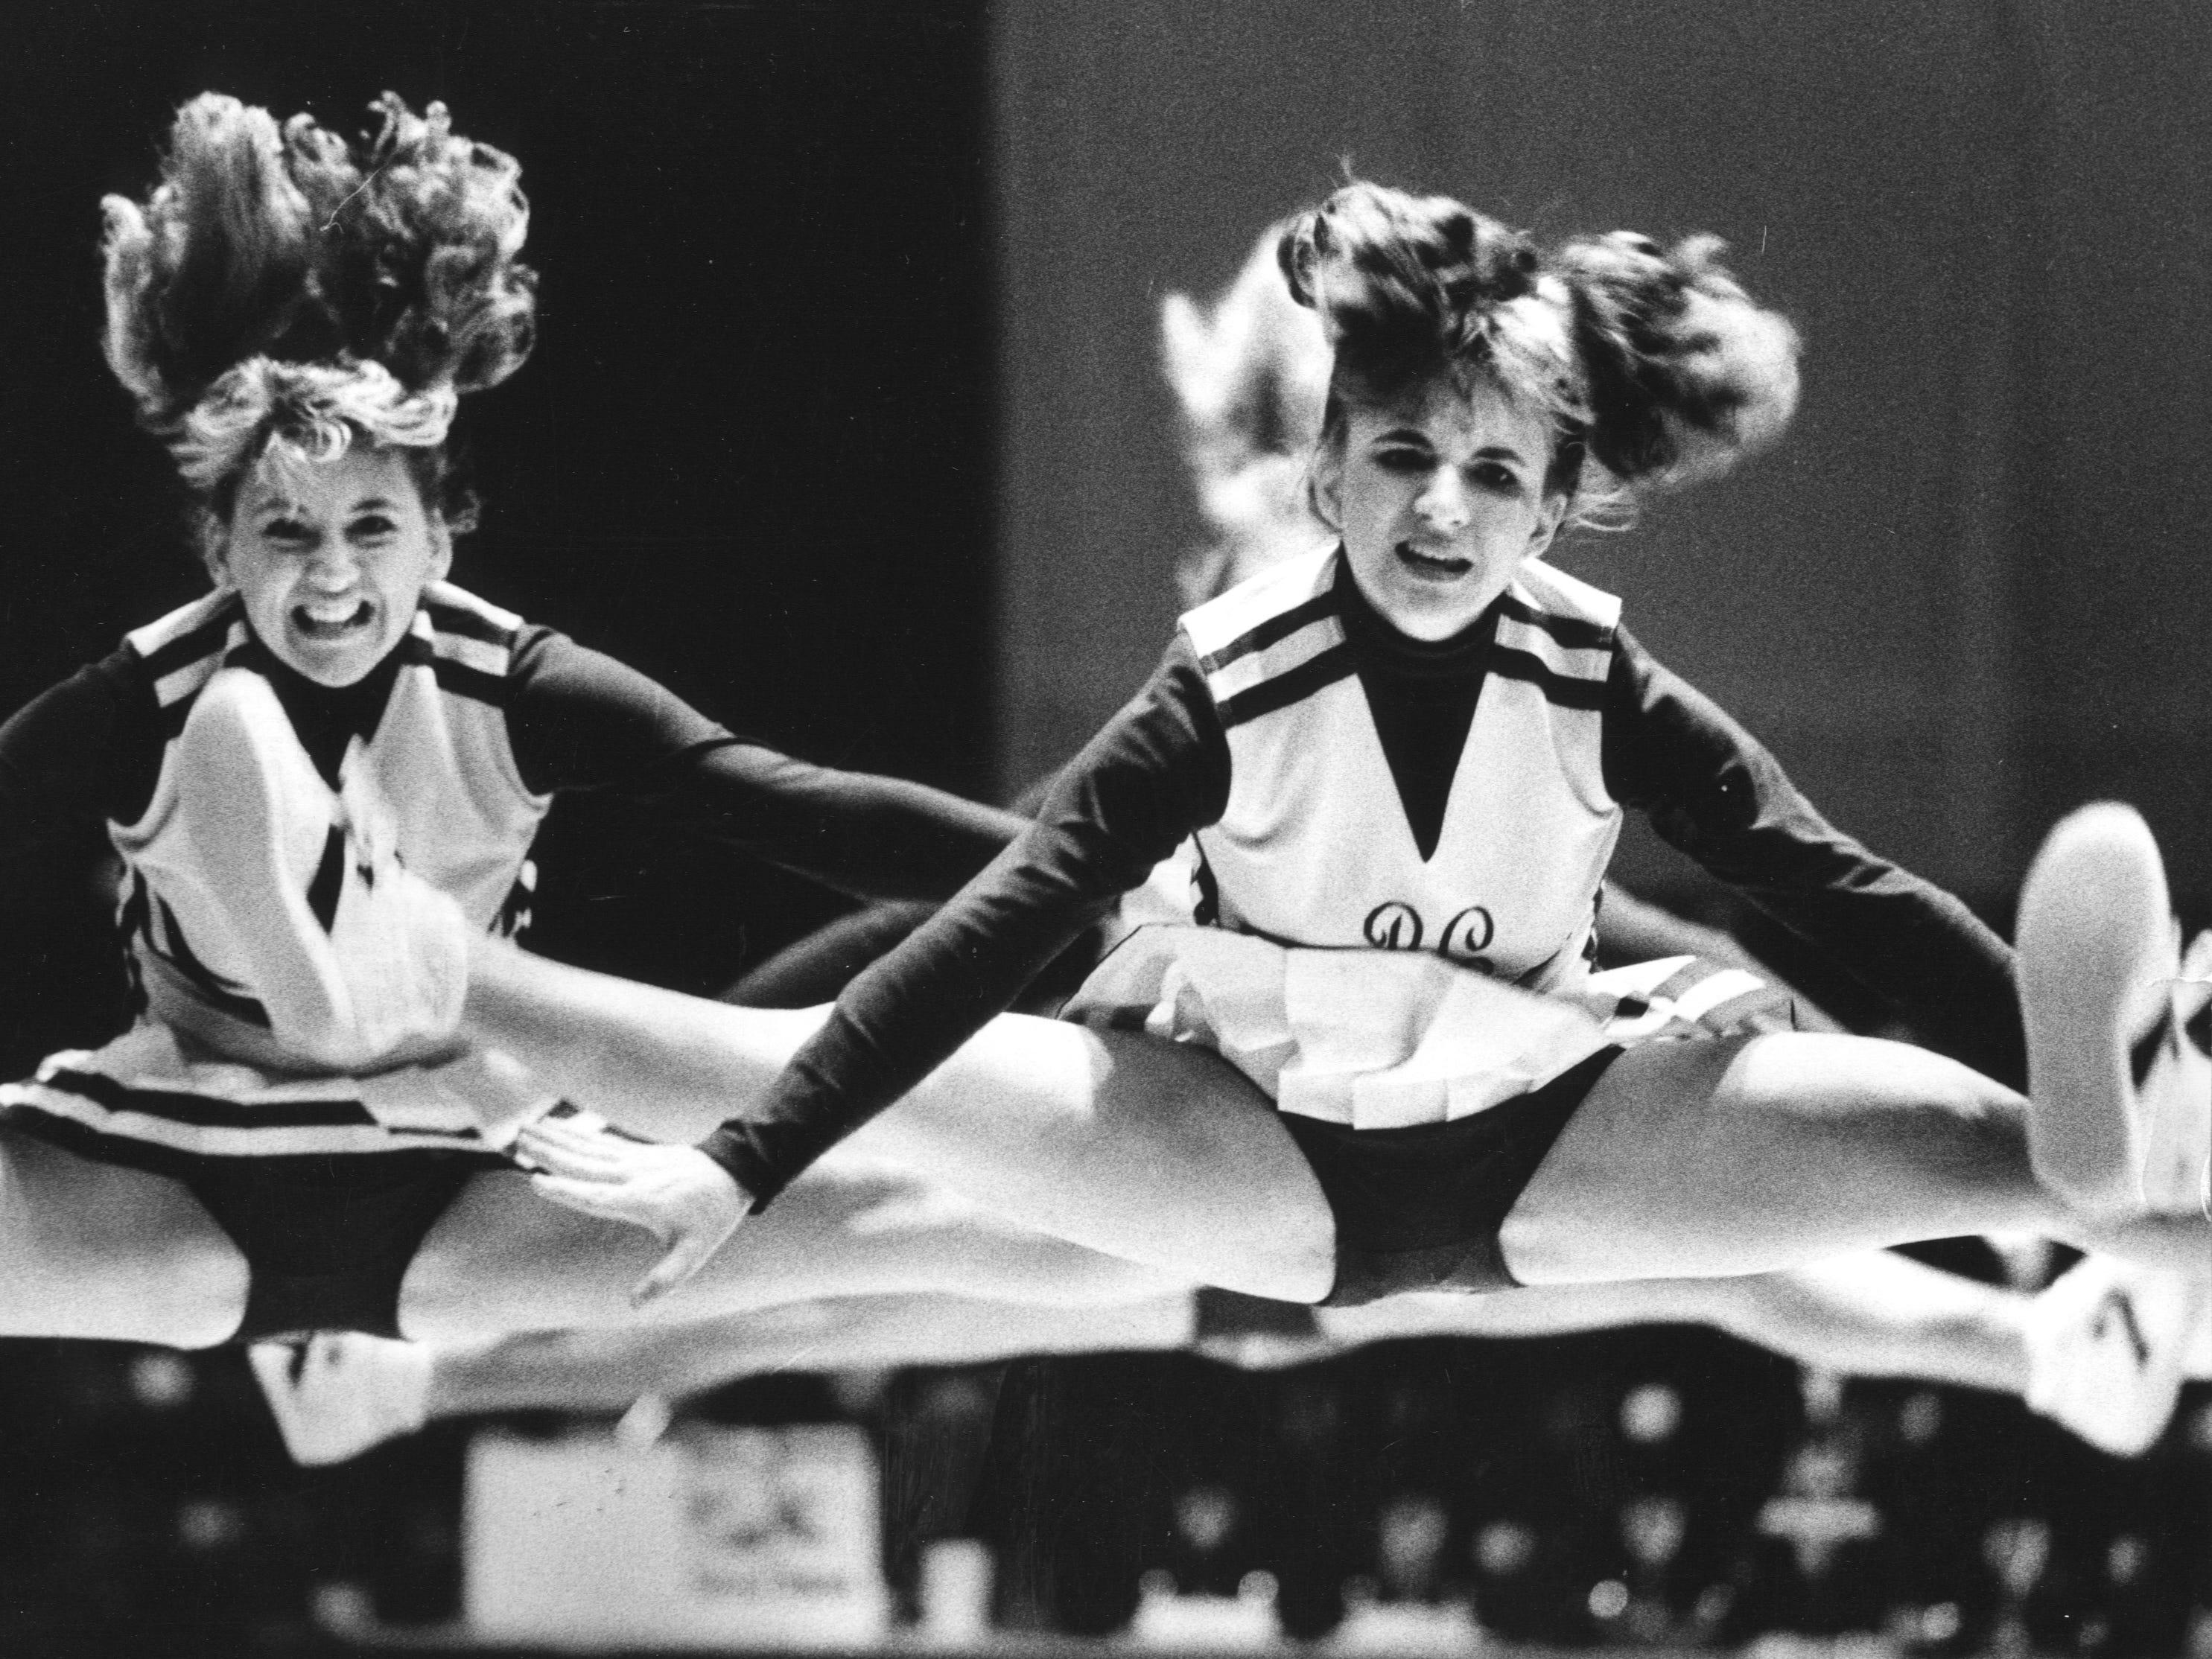 Barren's County's varsity cheerleaders performed yesterday at the YMCA cheerleading contest in Frankfort. Nov. 9, 1986